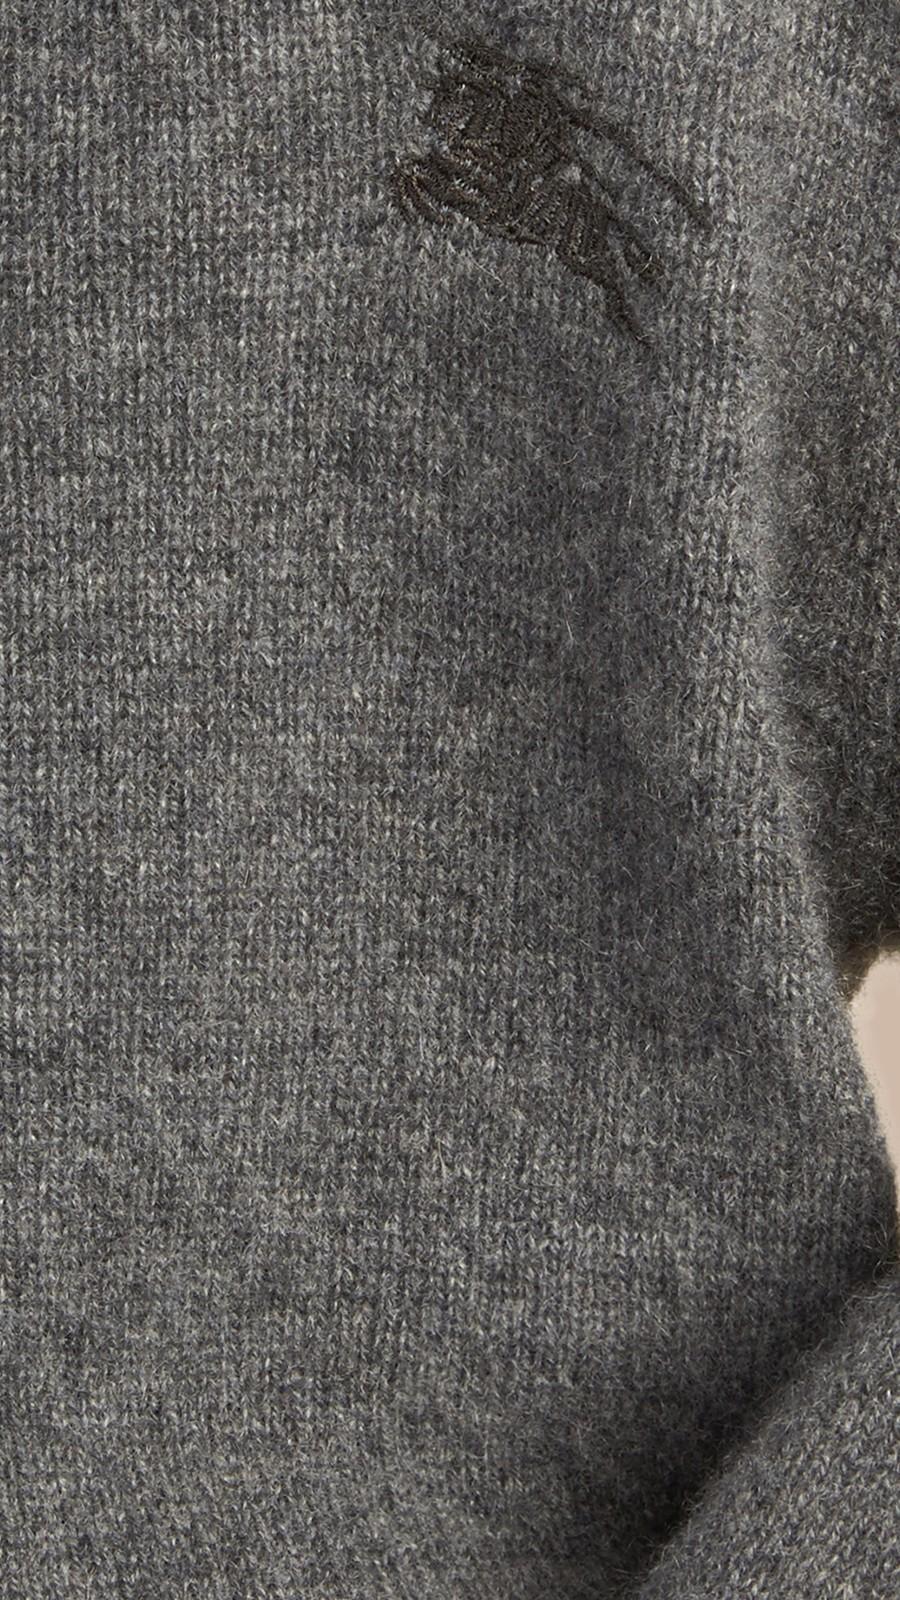 Mid grey melange Check Elbow Patch Cashmere Sweater Mid Grey Melange - Image 2